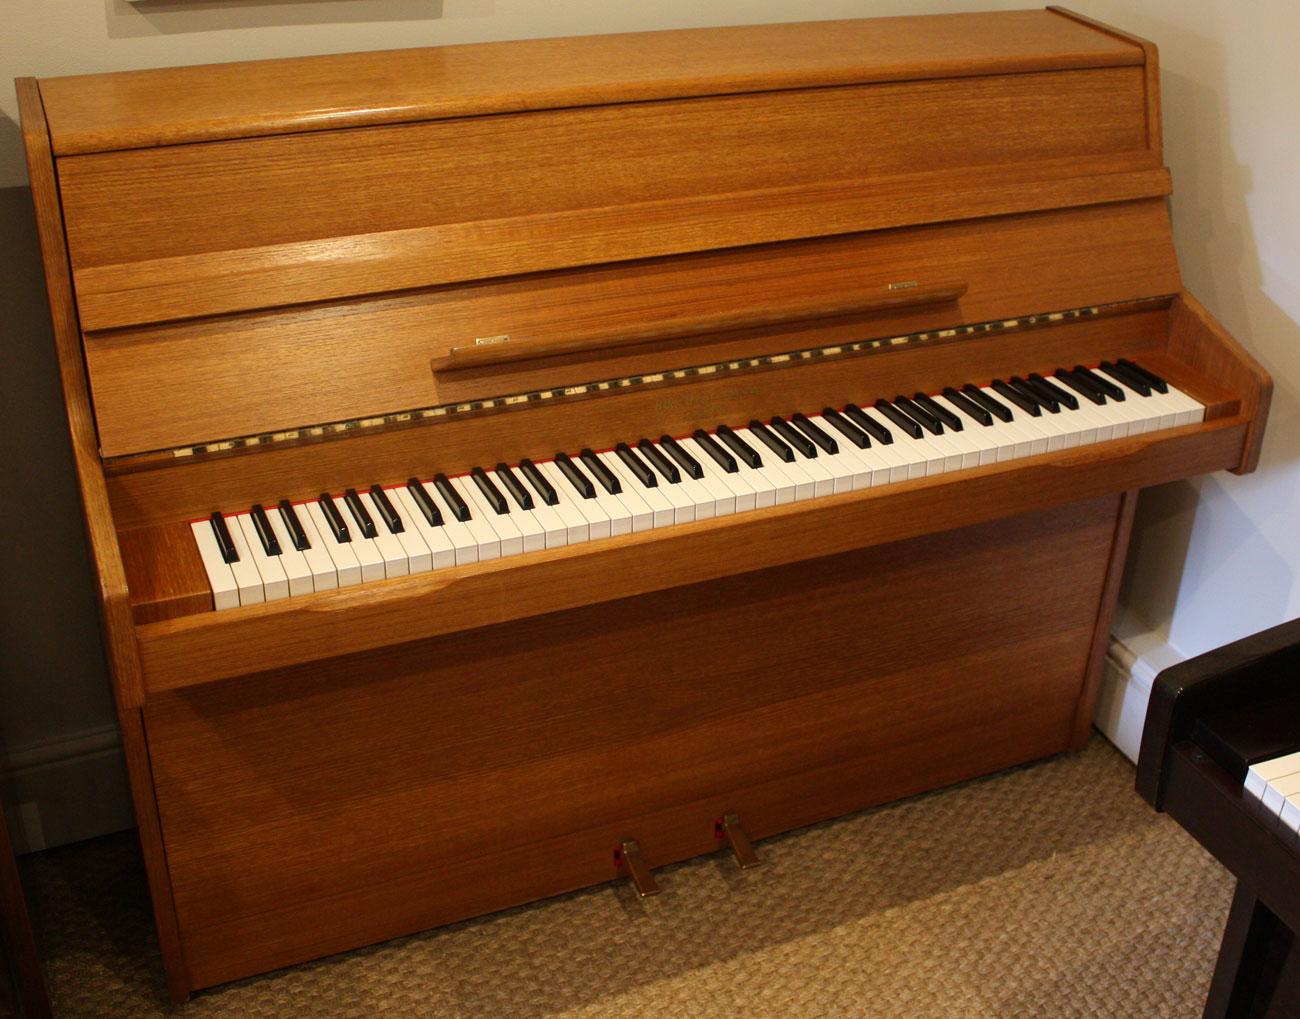 barratt robinson upright piano. Black Bedroom Furniture Sets. Home Design Ideas